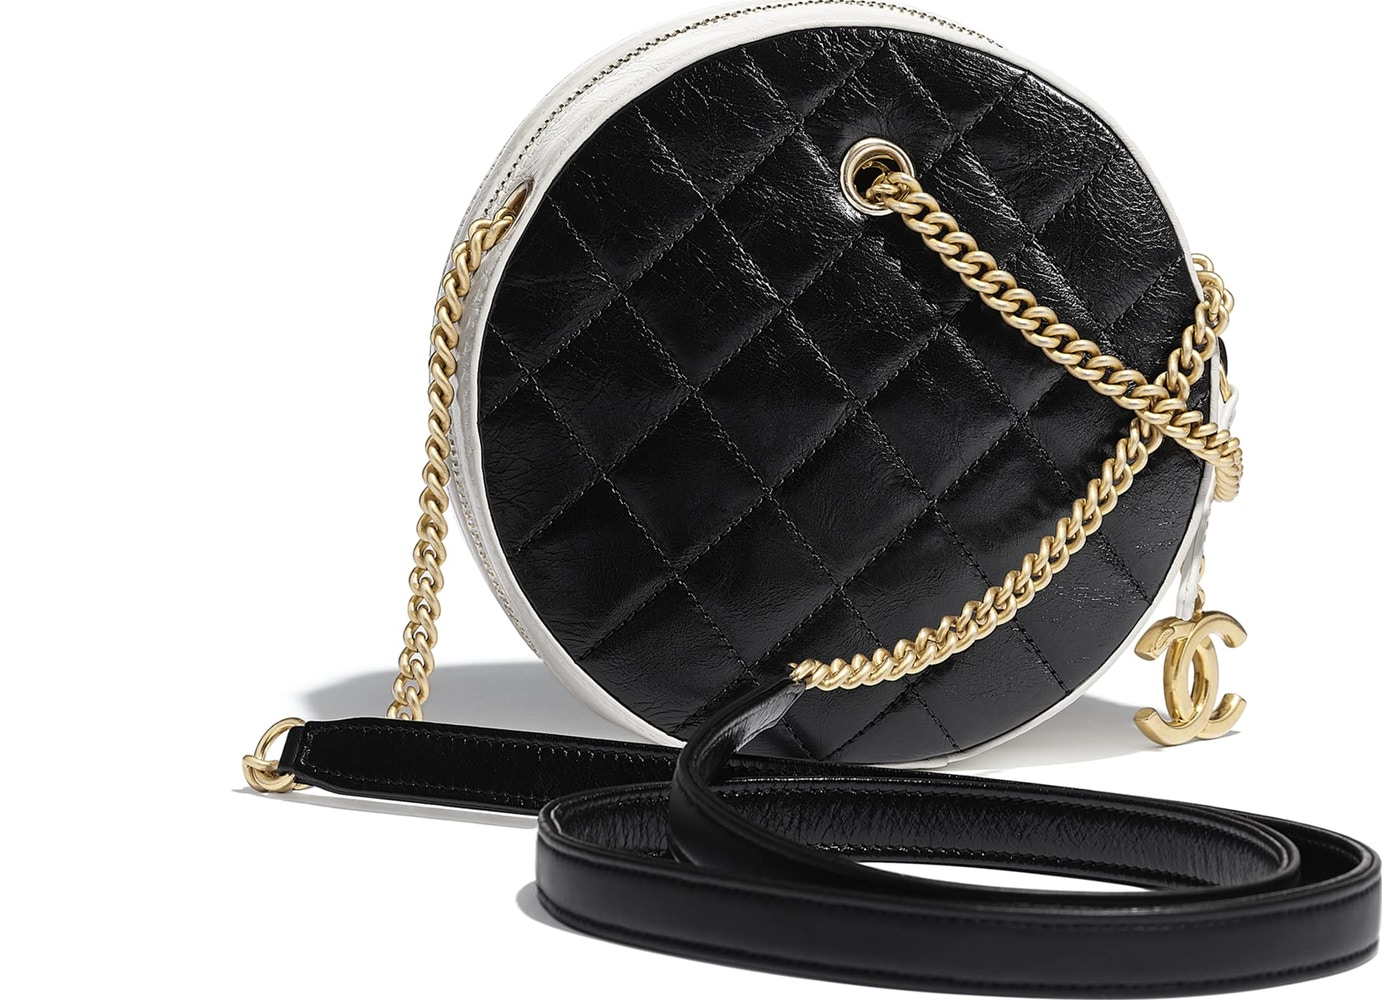 c9a2ffade64f Chanel Round Bag Crumpled Calfskin Gold-tone Small Black White